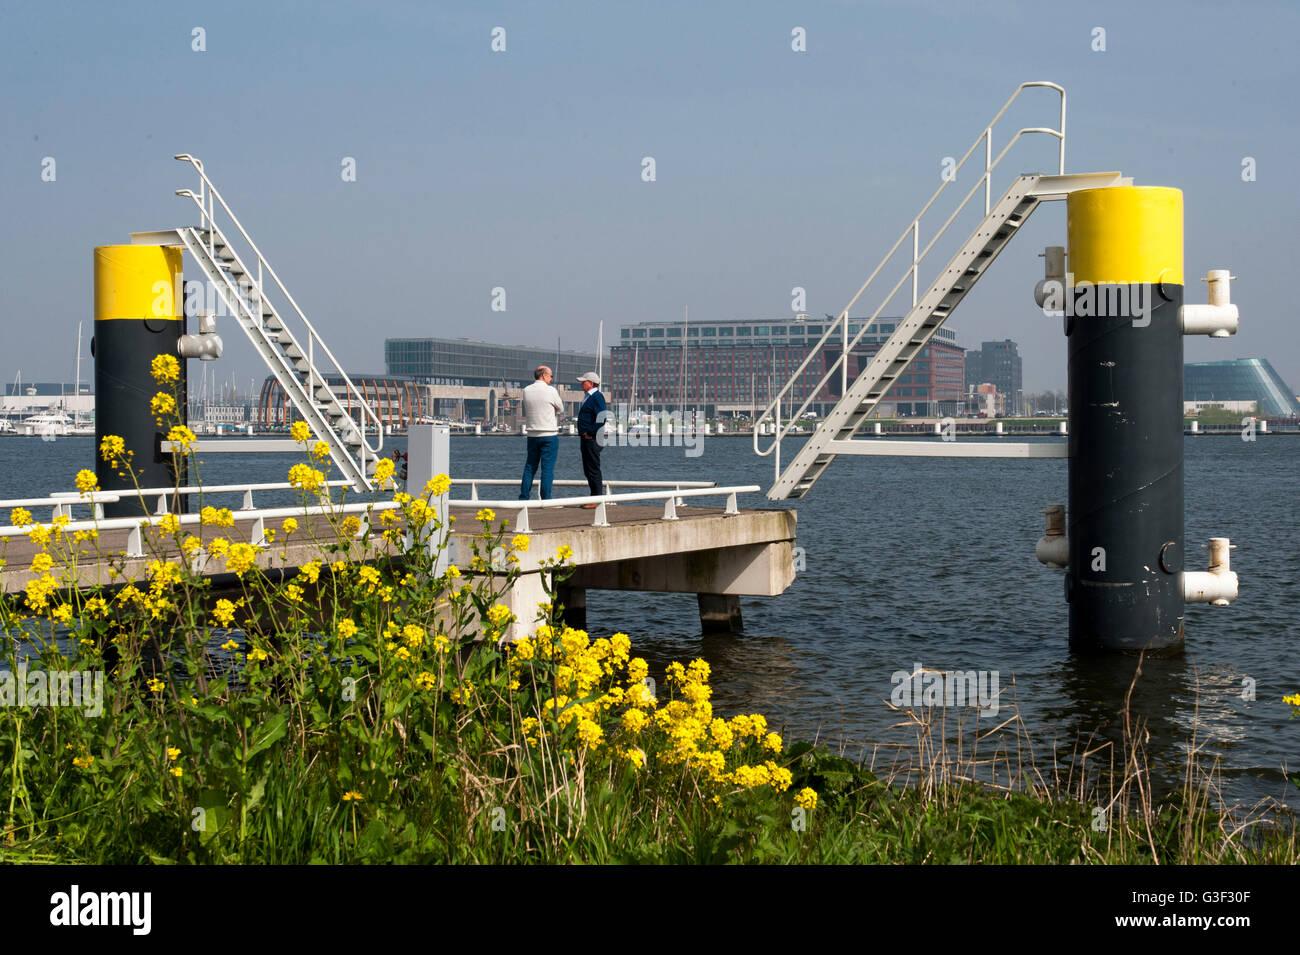 Ij, pier, harbour IJ, Amsterdam-Noord (borough), Amsterdam, Holland, Netherlands - Stock Image